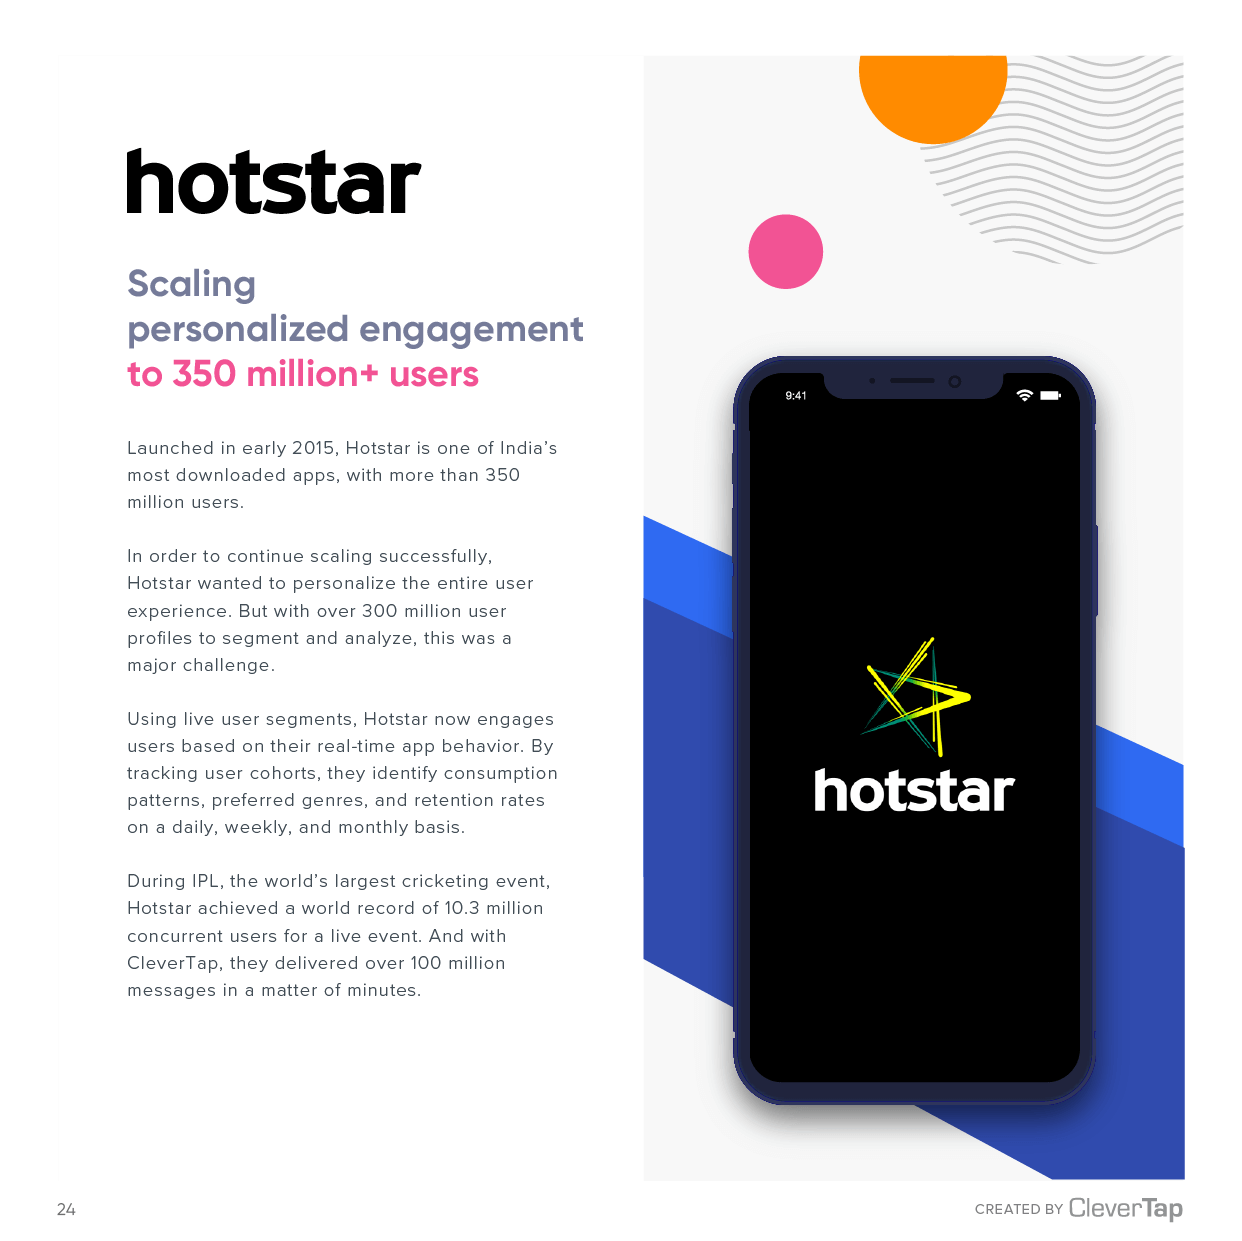 Hotstar Case Study